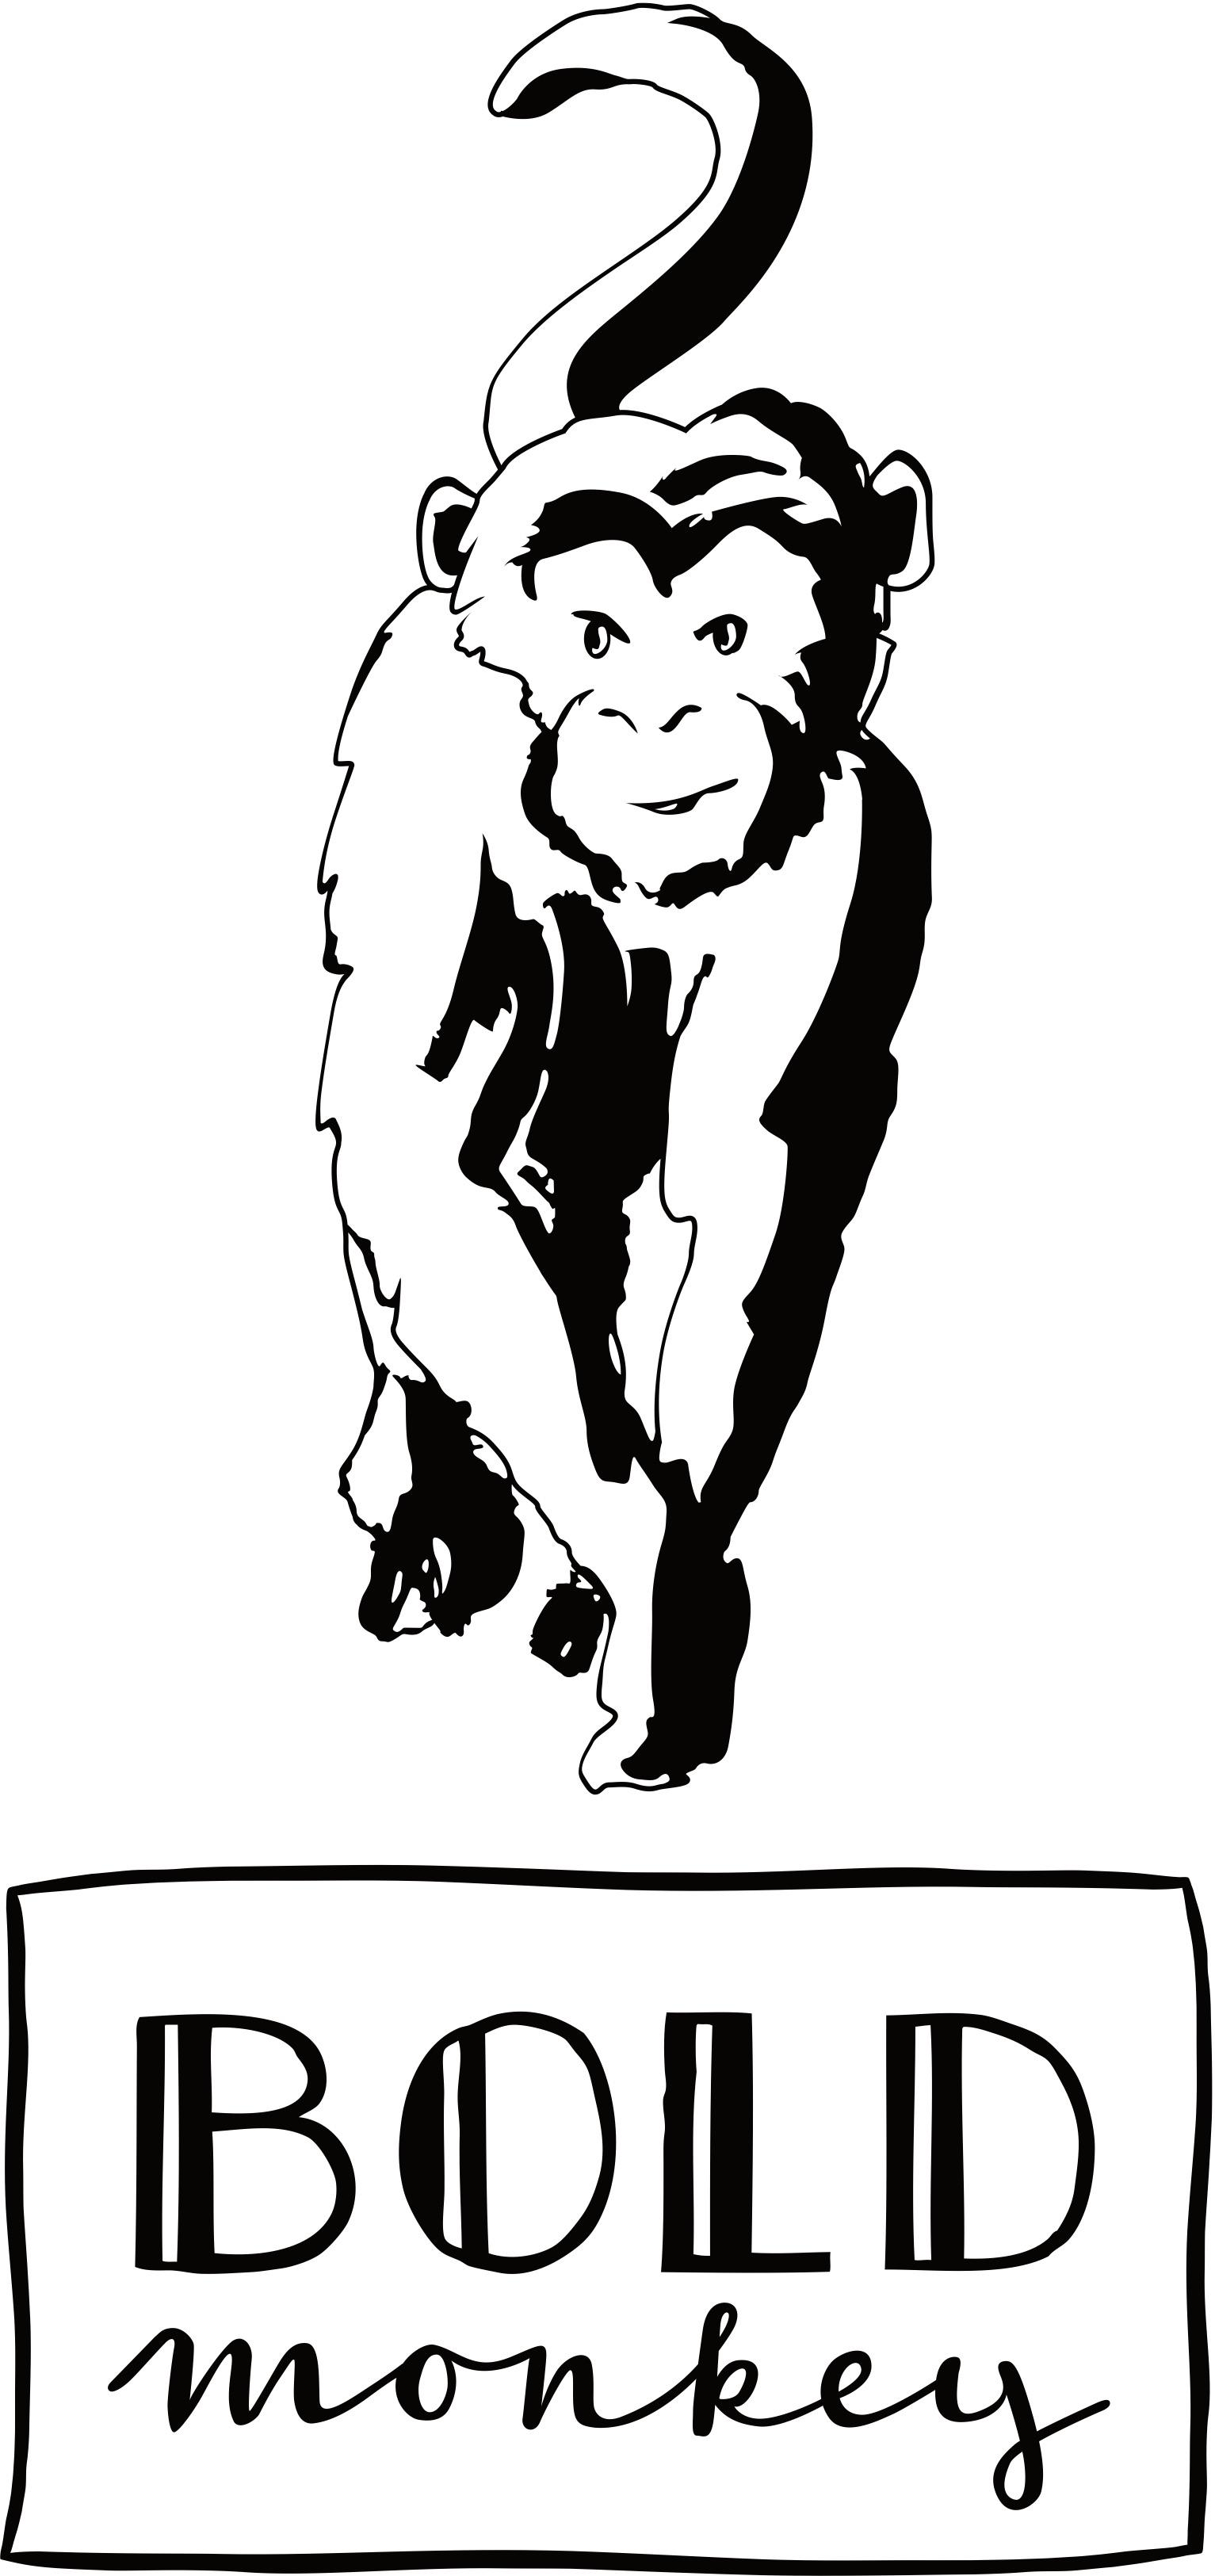 bold monkey Swinging Lines vloerkleed 200x300 beige